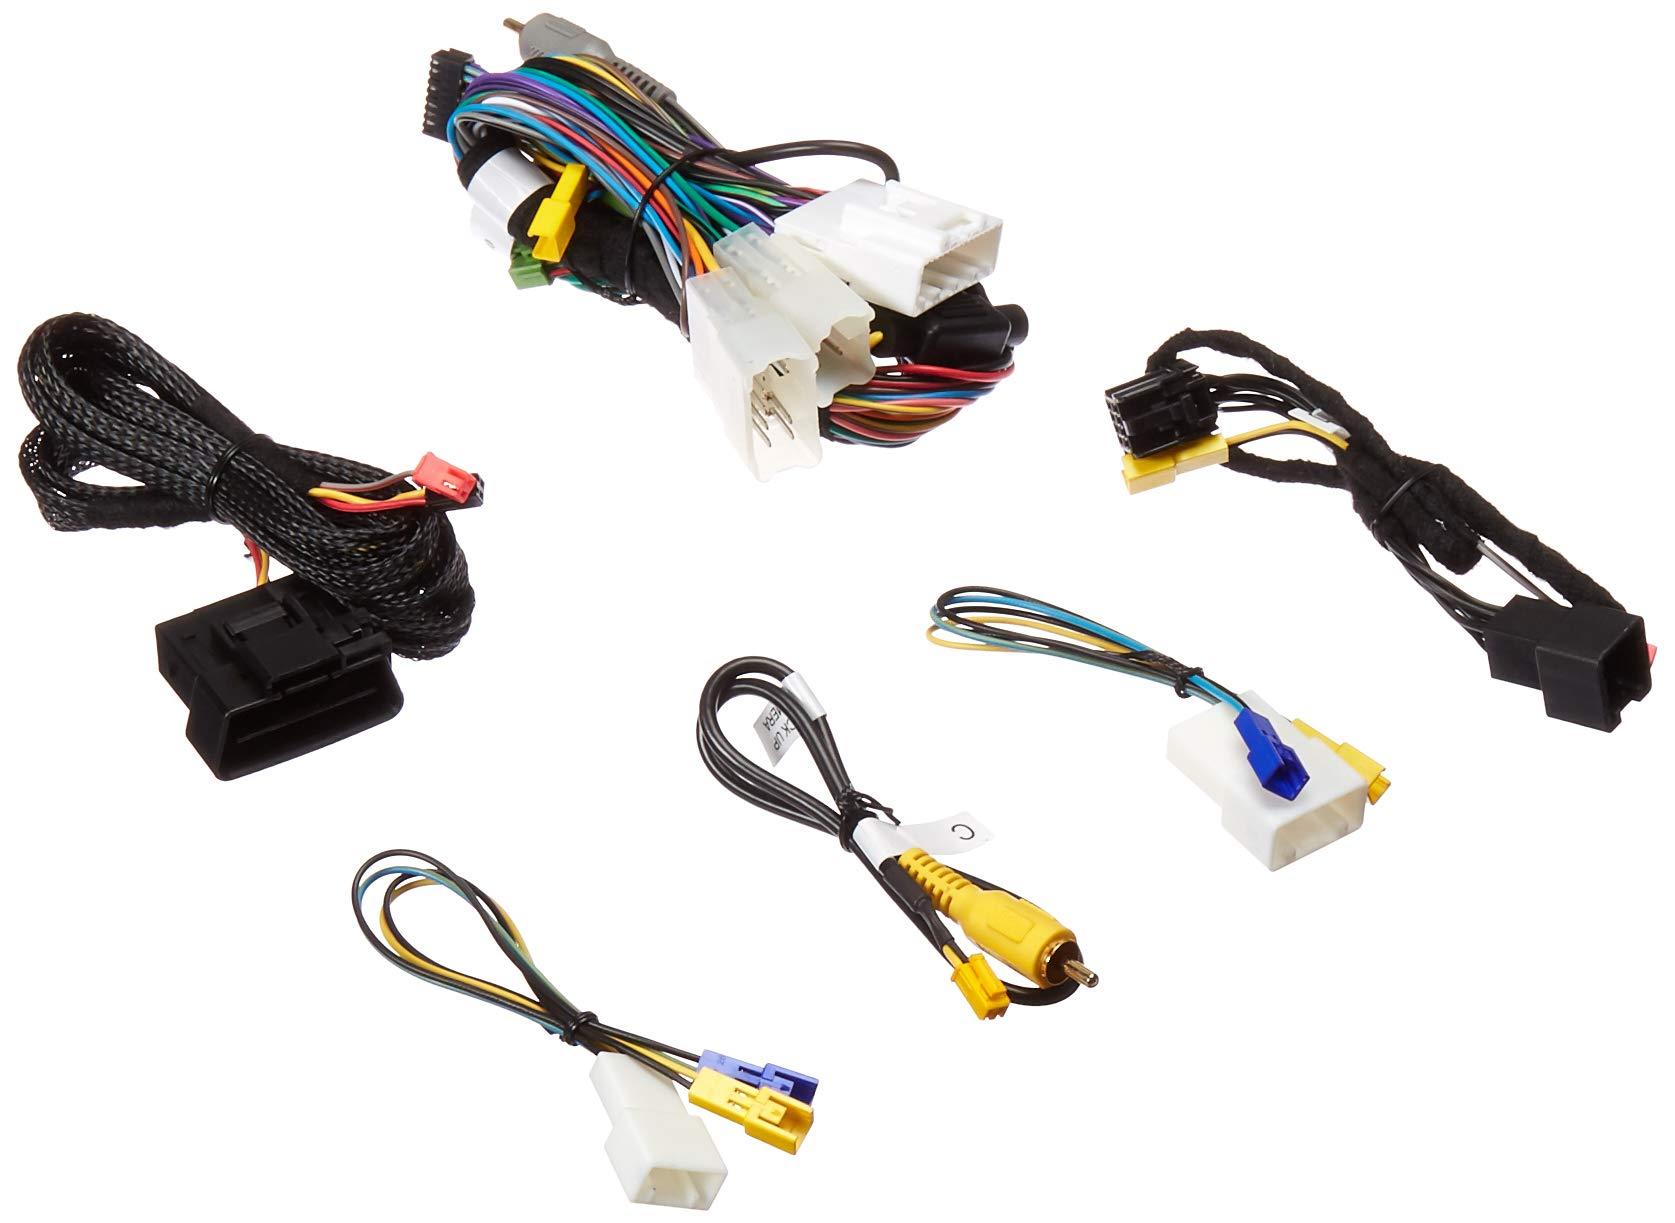 Maestro HRN-RR-SU2 Plug and Play T-Harness for SU2 Subaru Vehicles by Maestro